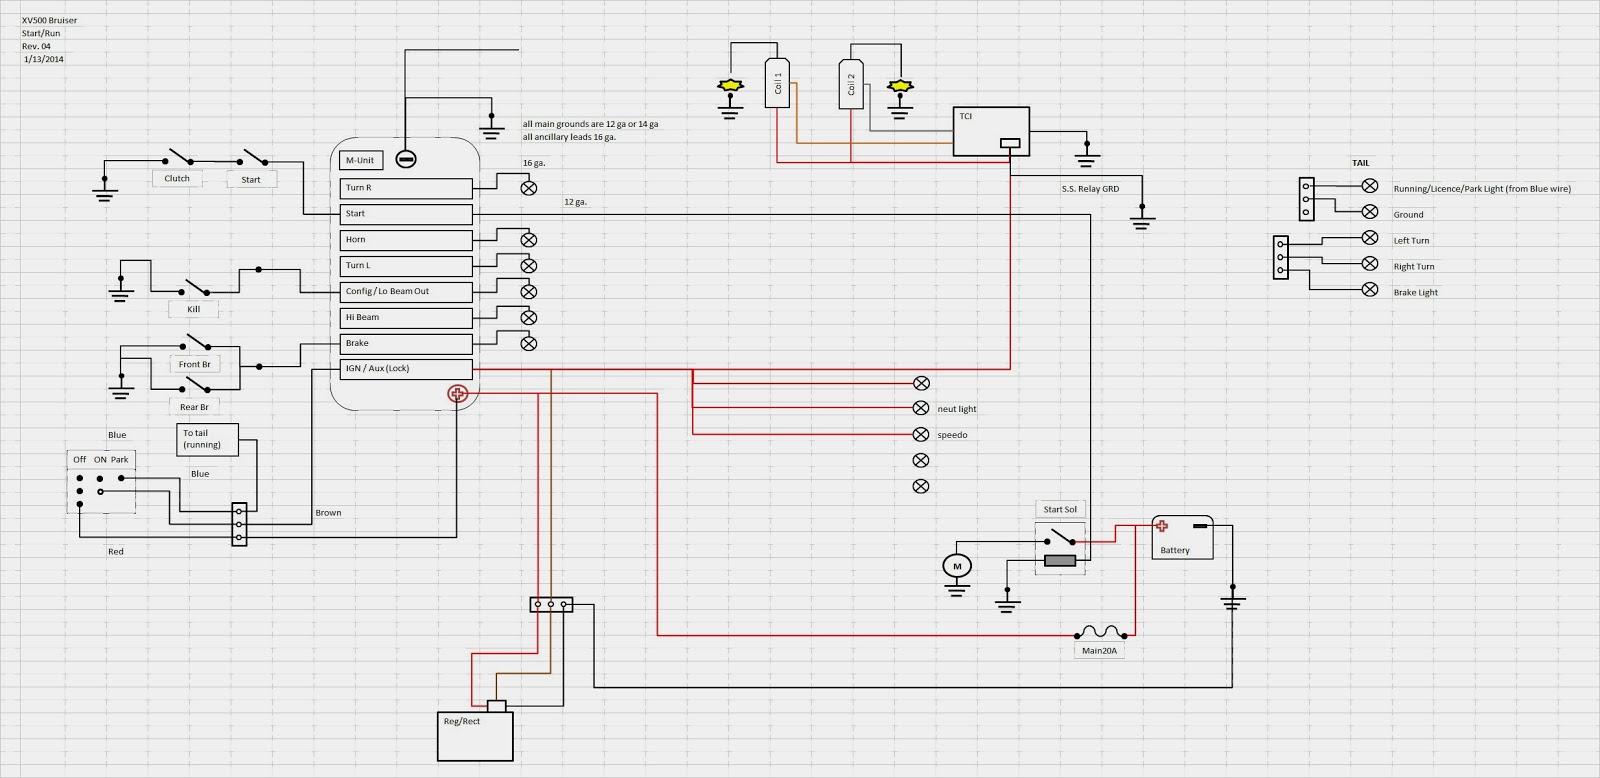 big stuff 3 wiring diagram 2002 jetta vacuum hose thirstforspeed the